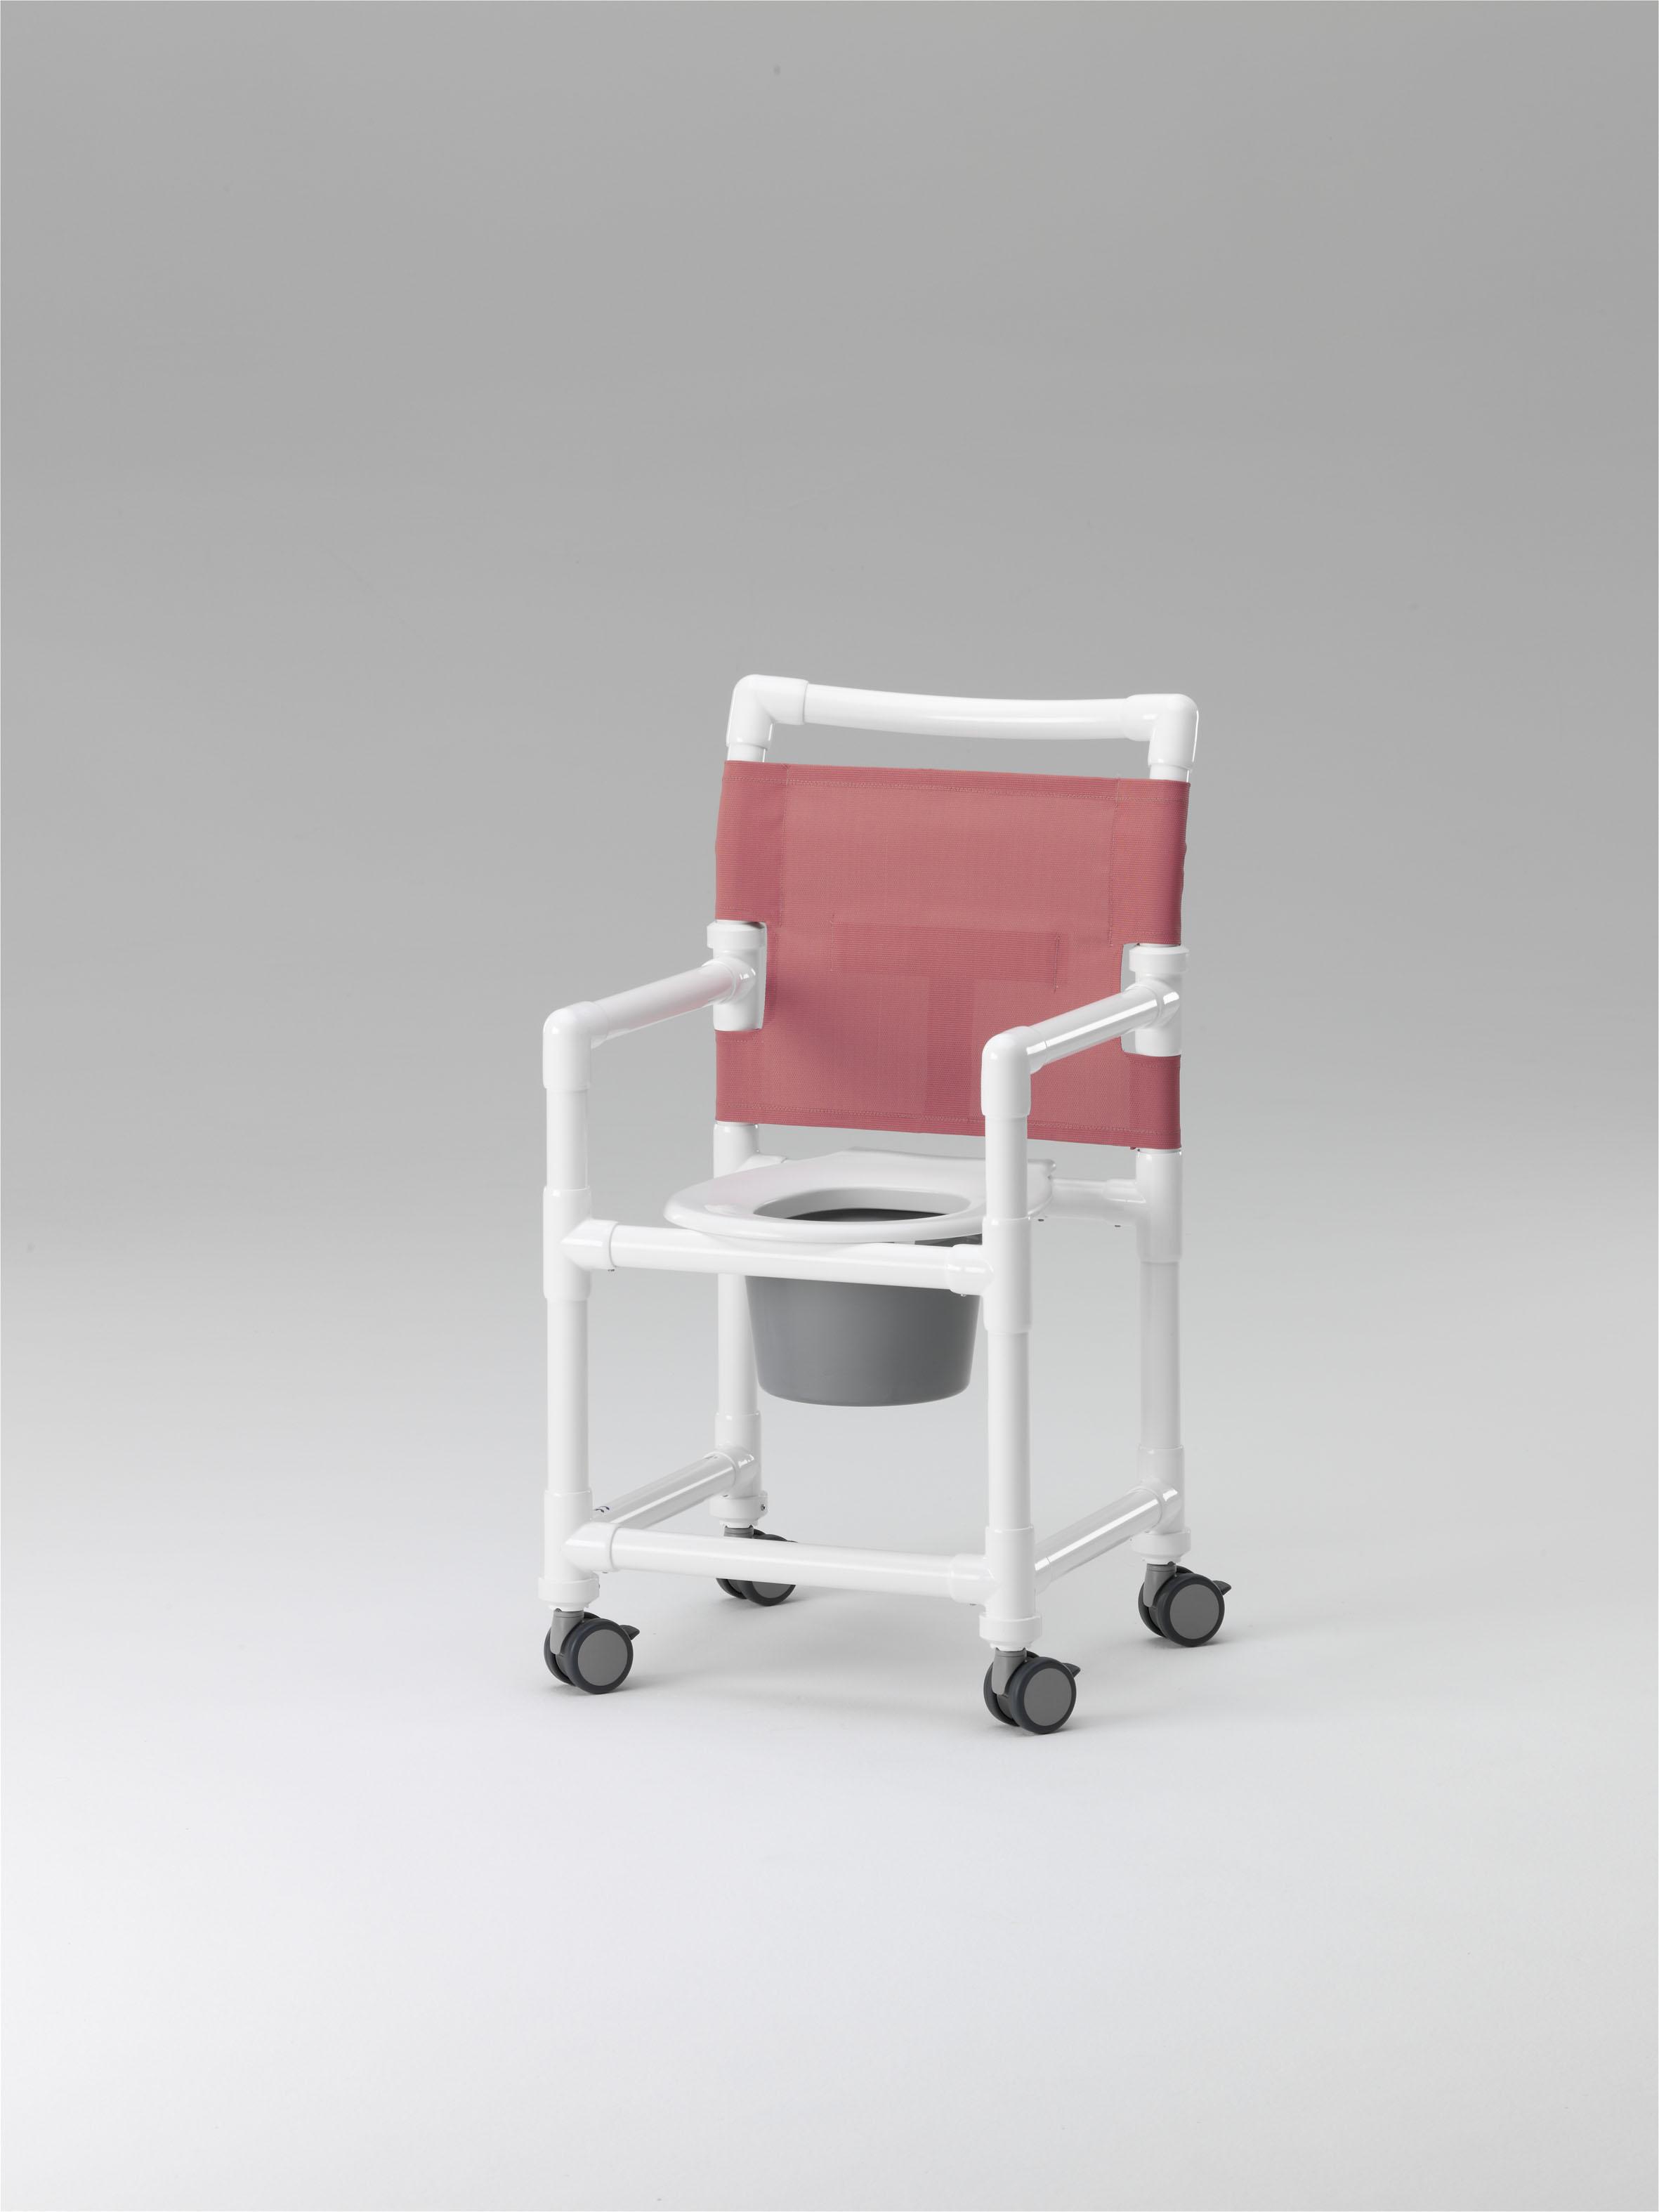 Hjælpemiddelbasen - Bade-/toiletstol, SCC 250 fra Scan-Med.